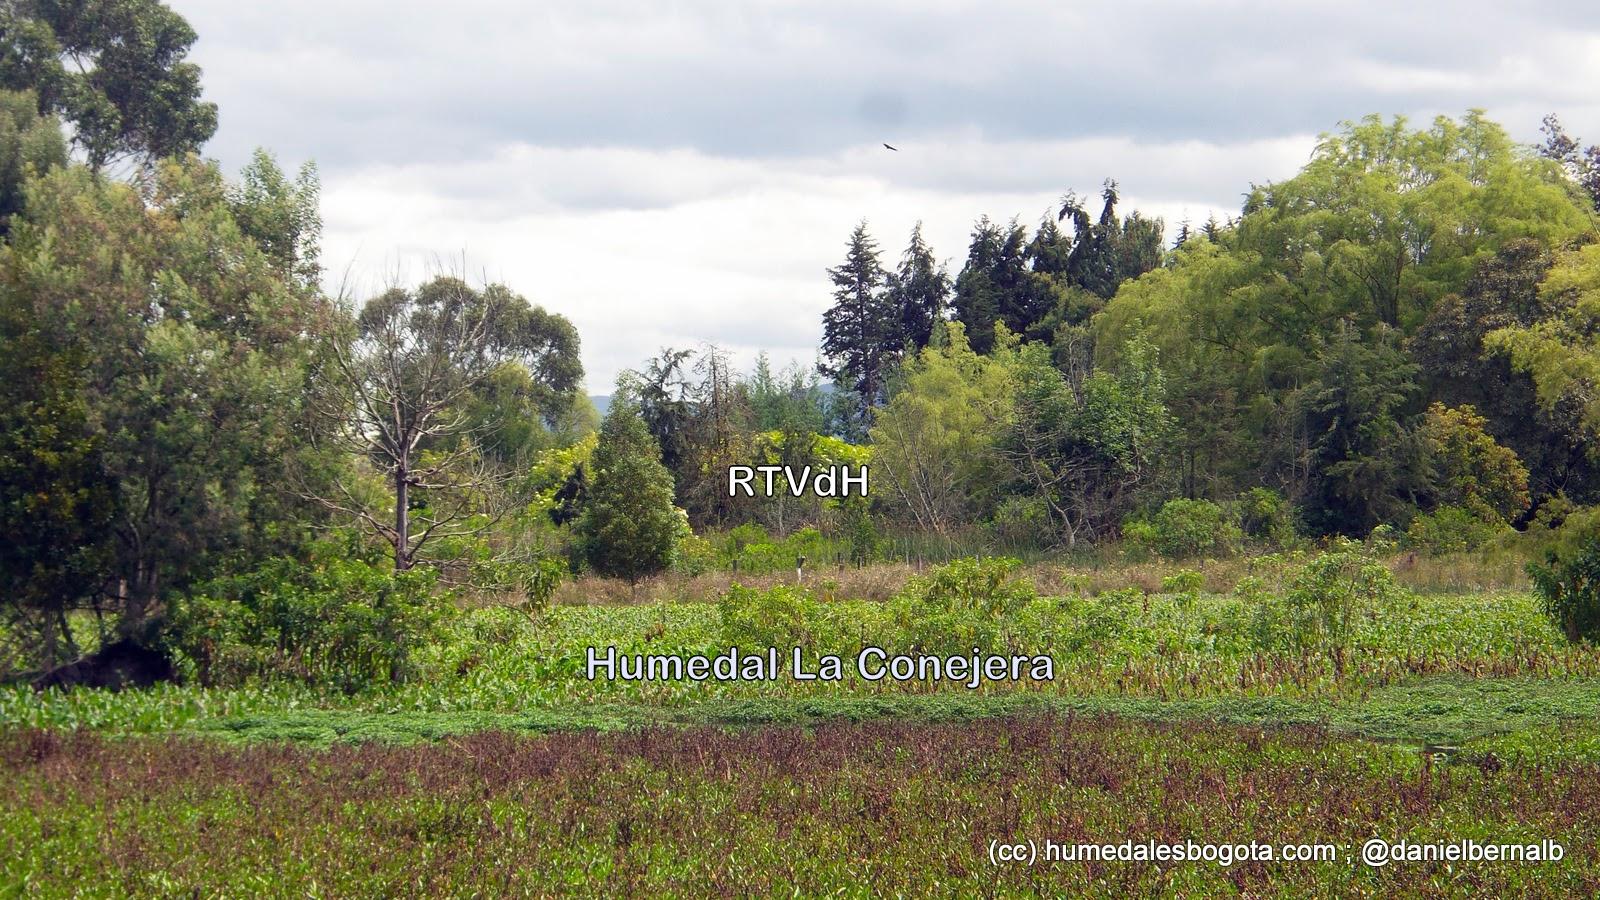 Humedal La Conejera vecino a la Reserva Thomas Van der Hammen